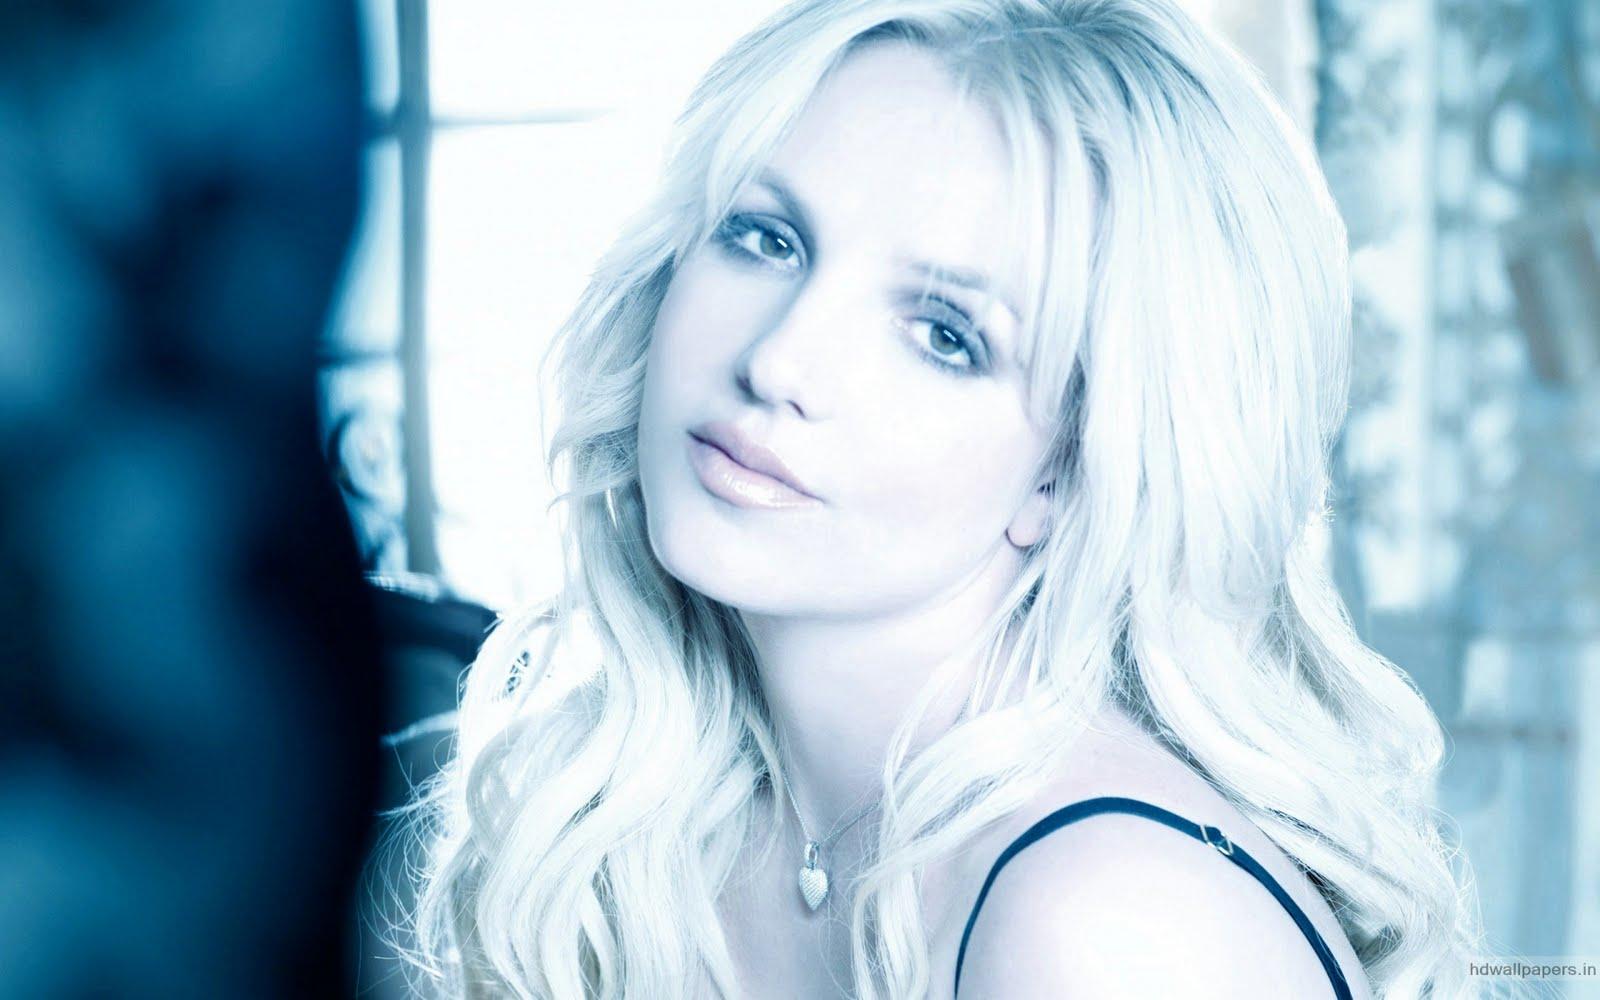 http://4.bp.blogspot.com/-EI6A_rZf9uM/TmMESZAvhoI/AAAAAAAACh8/sGlKPsMYACc/s1600/Britney+Spears+2011+Hair.jpg